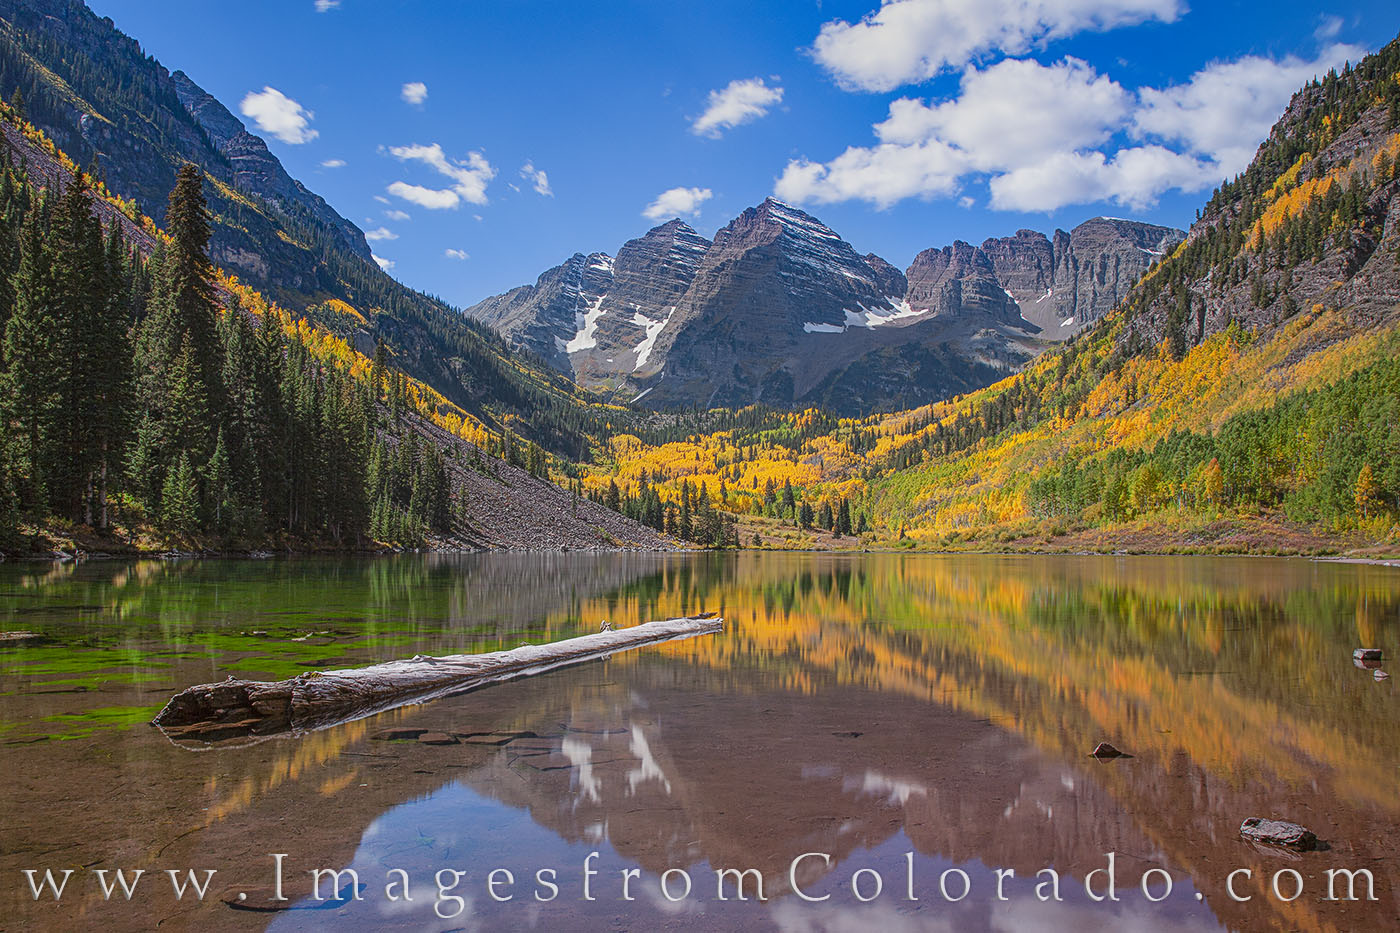 maroon bells, maroon lake, aspen, 14ers, fall, autumn, gold, september, elk mountains, elk range, morning, crisp, cool, photo